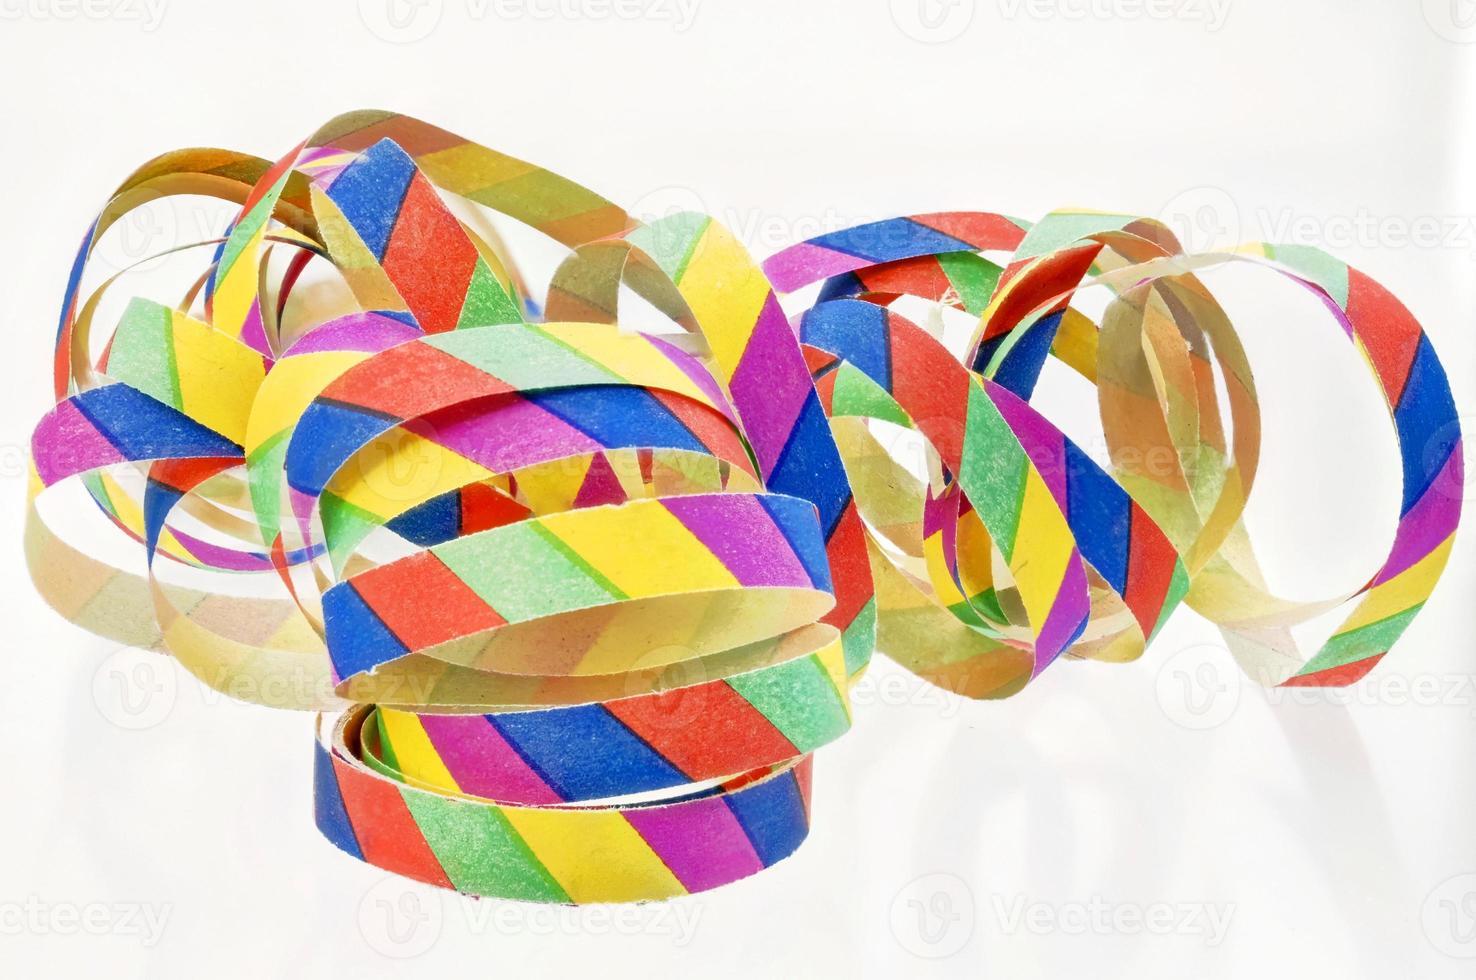 serpentinas coloridas feitas de papel foto